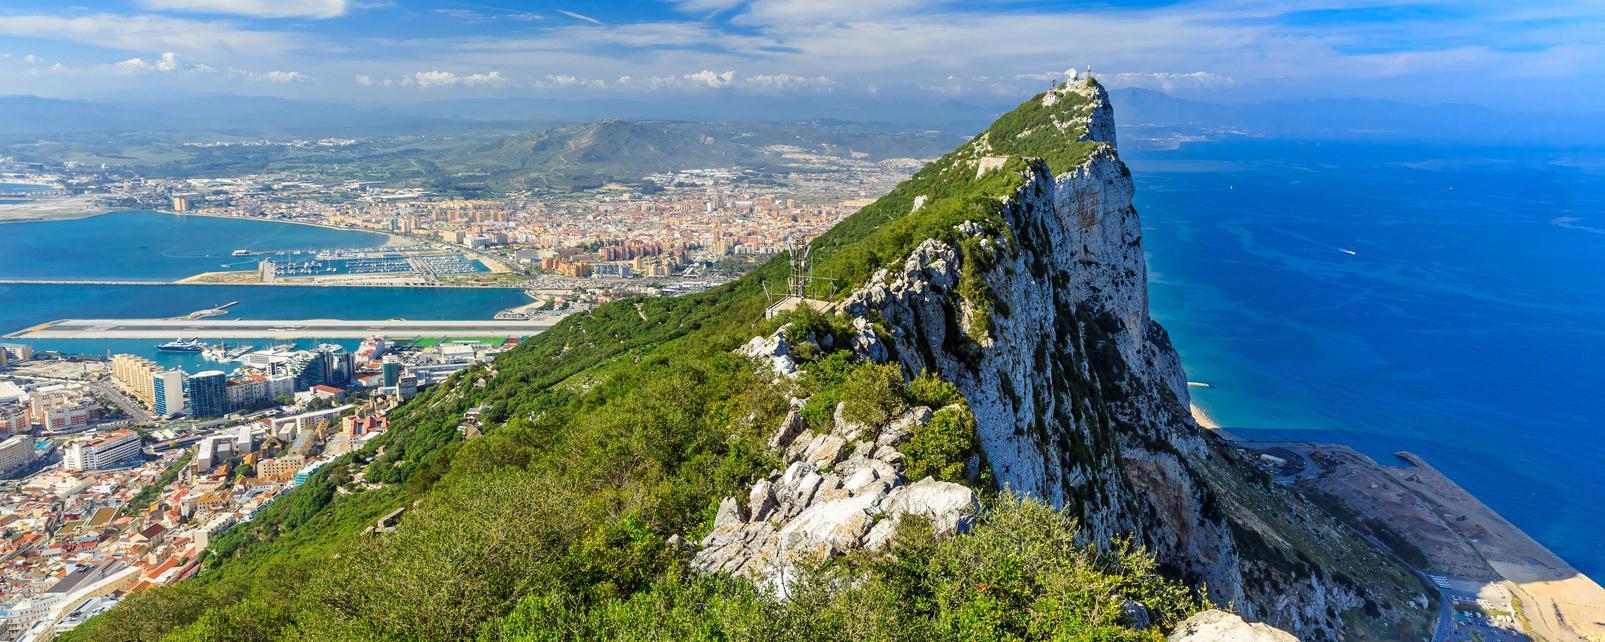 Europe; Espagne; Royaume-Uni; Gibraltar; Rocher; ville; La Linea; mer; ciel;